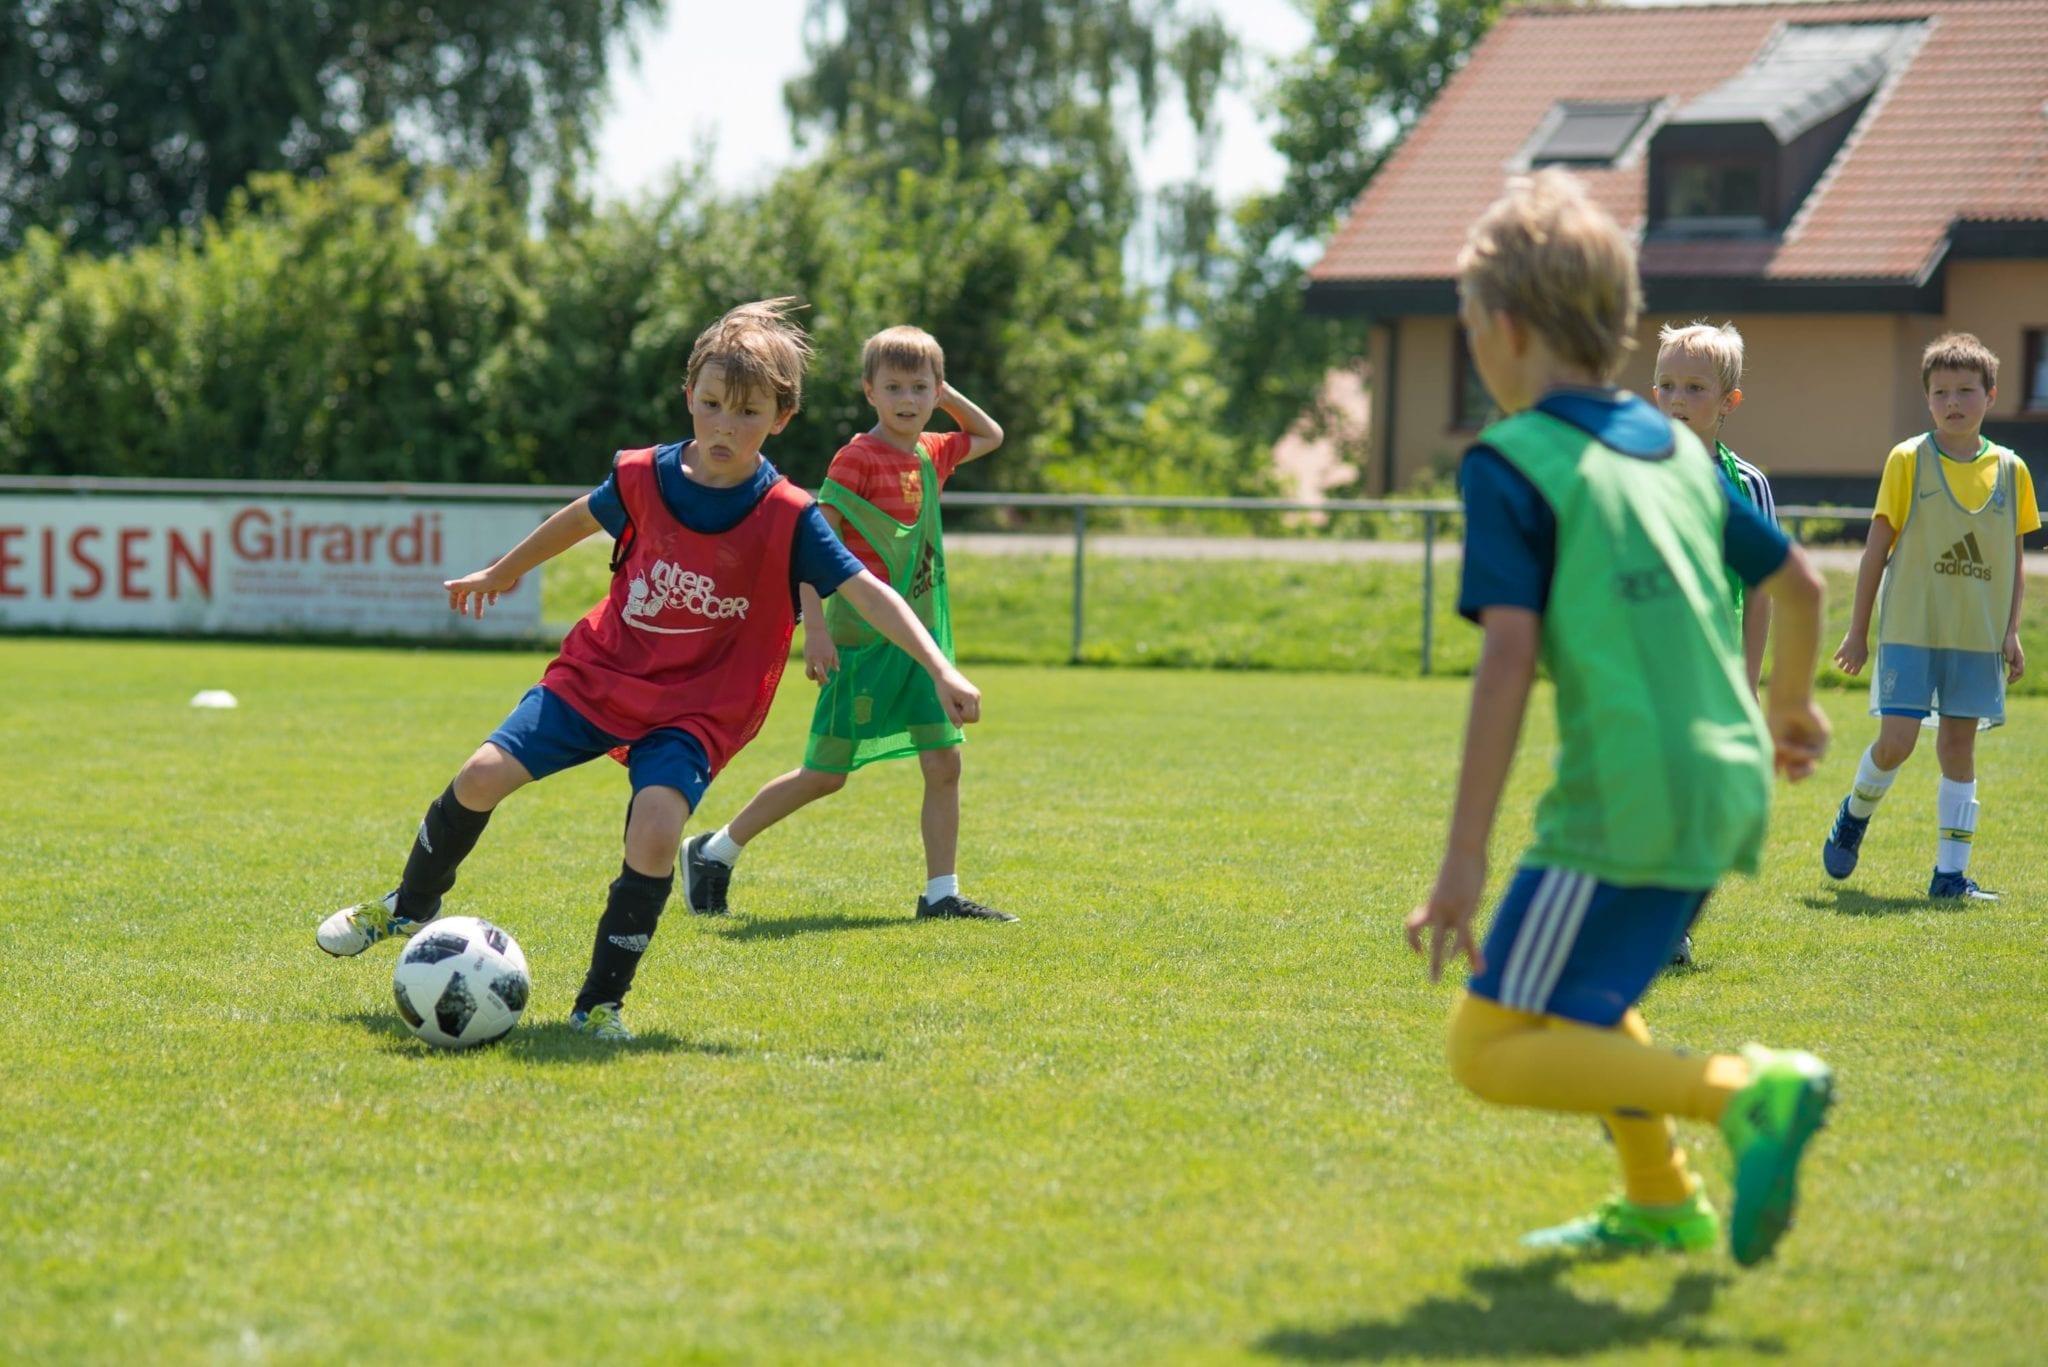 Week-ends Soccer League